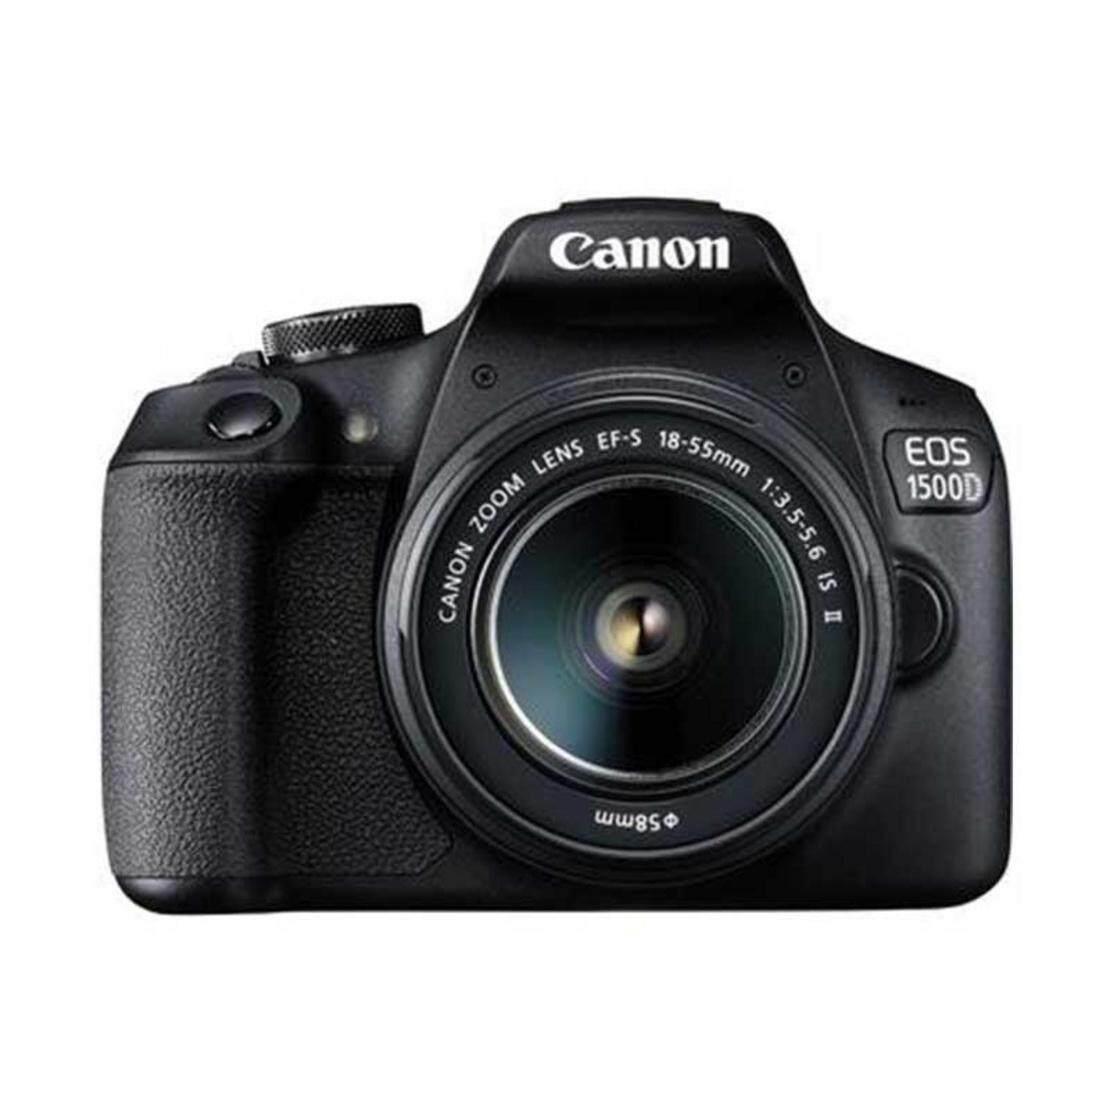 Canon กล้อง DSLR รุ่น EOS 1500D Kit EF-S18-55 IS II ประกันศูนย์ไทย